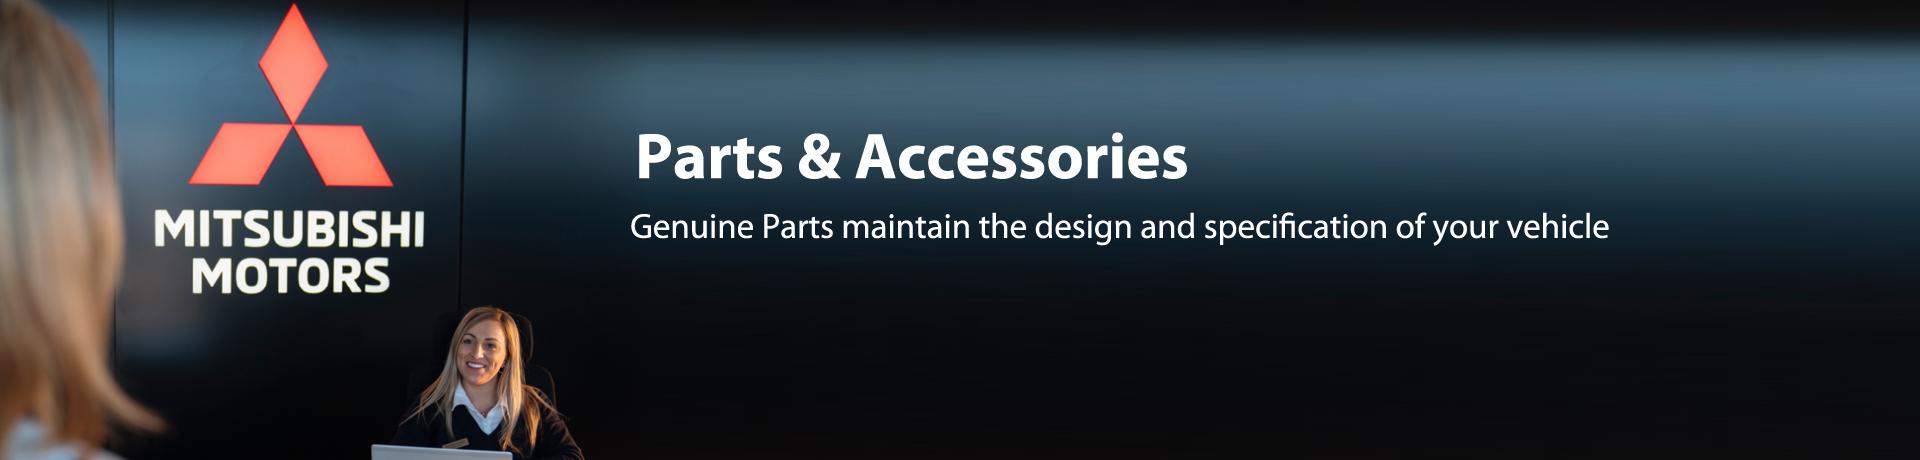 Genuine-Parts-Accessories